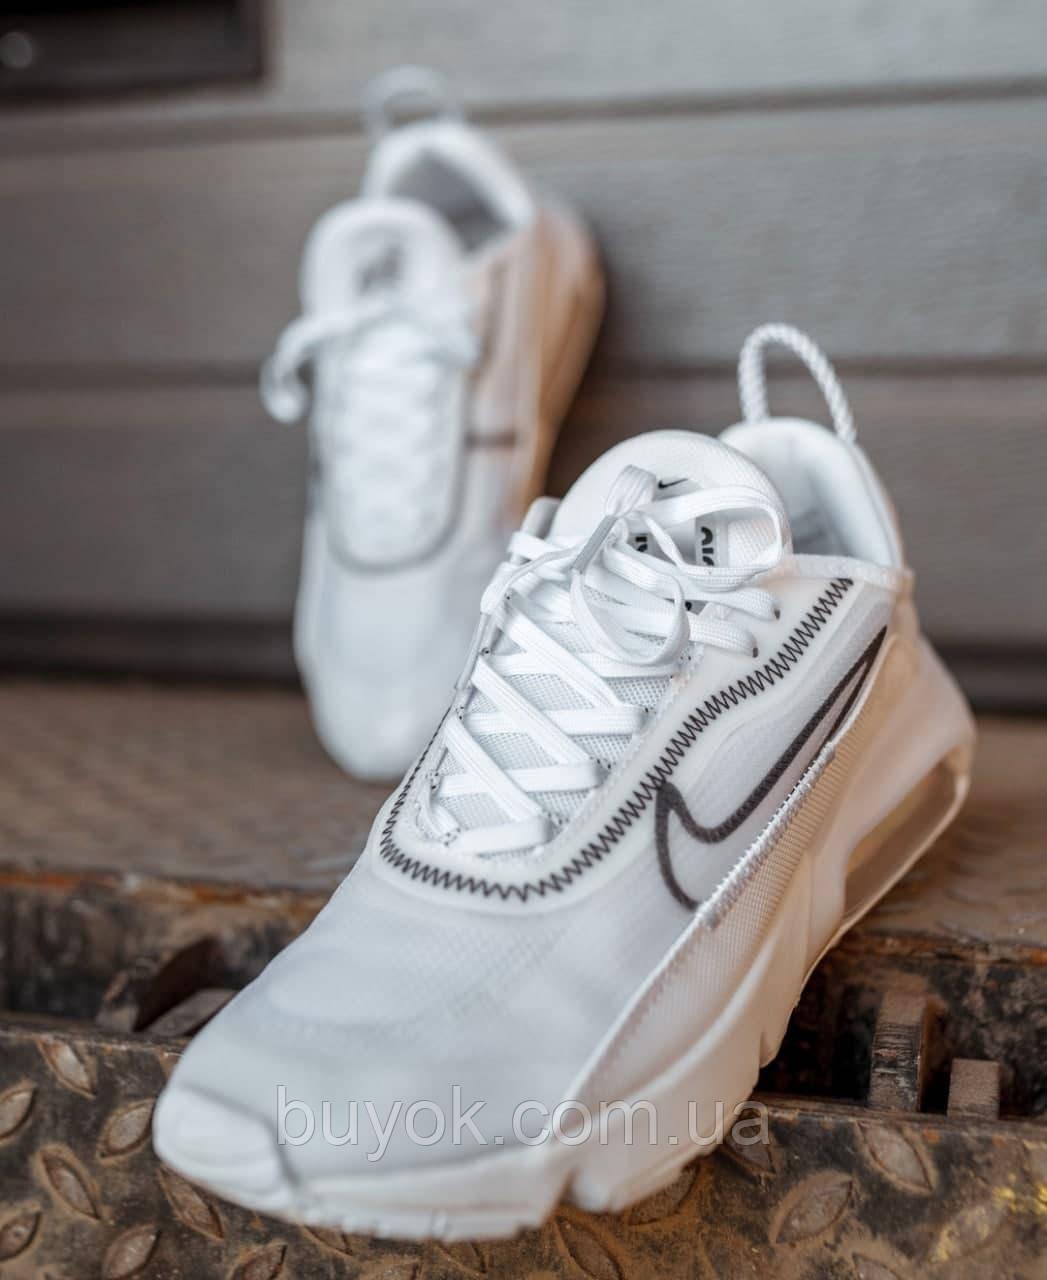 Женские кроссовки Nike Air Max 2090 White Black White CK2612-100